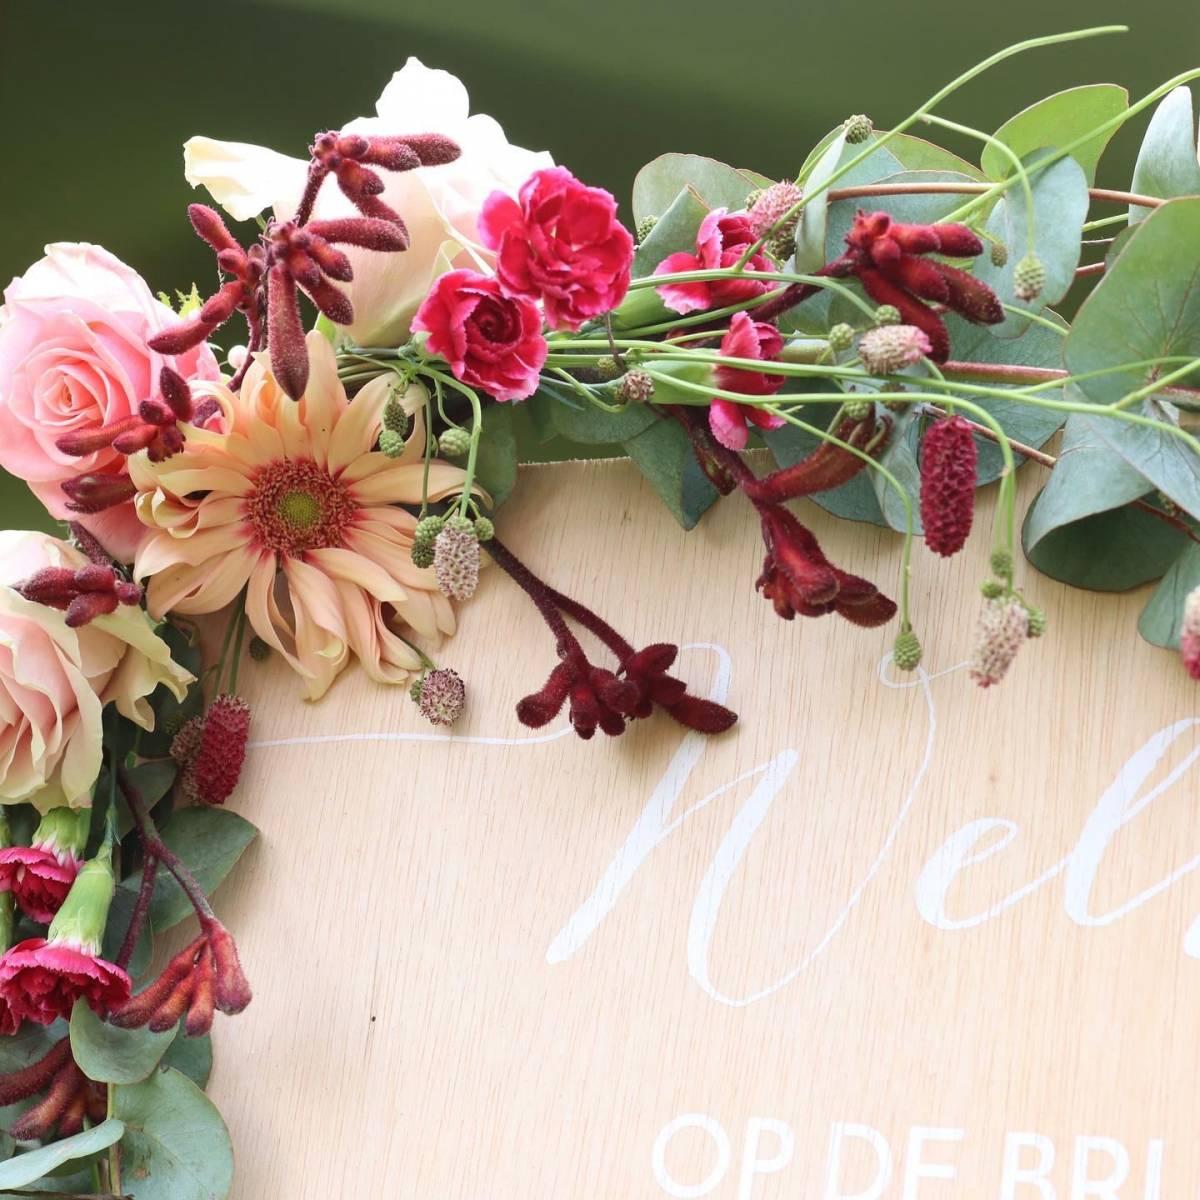 Maison Fleurie - Fotograaf zelfgetrokken - House of Weddings - 21